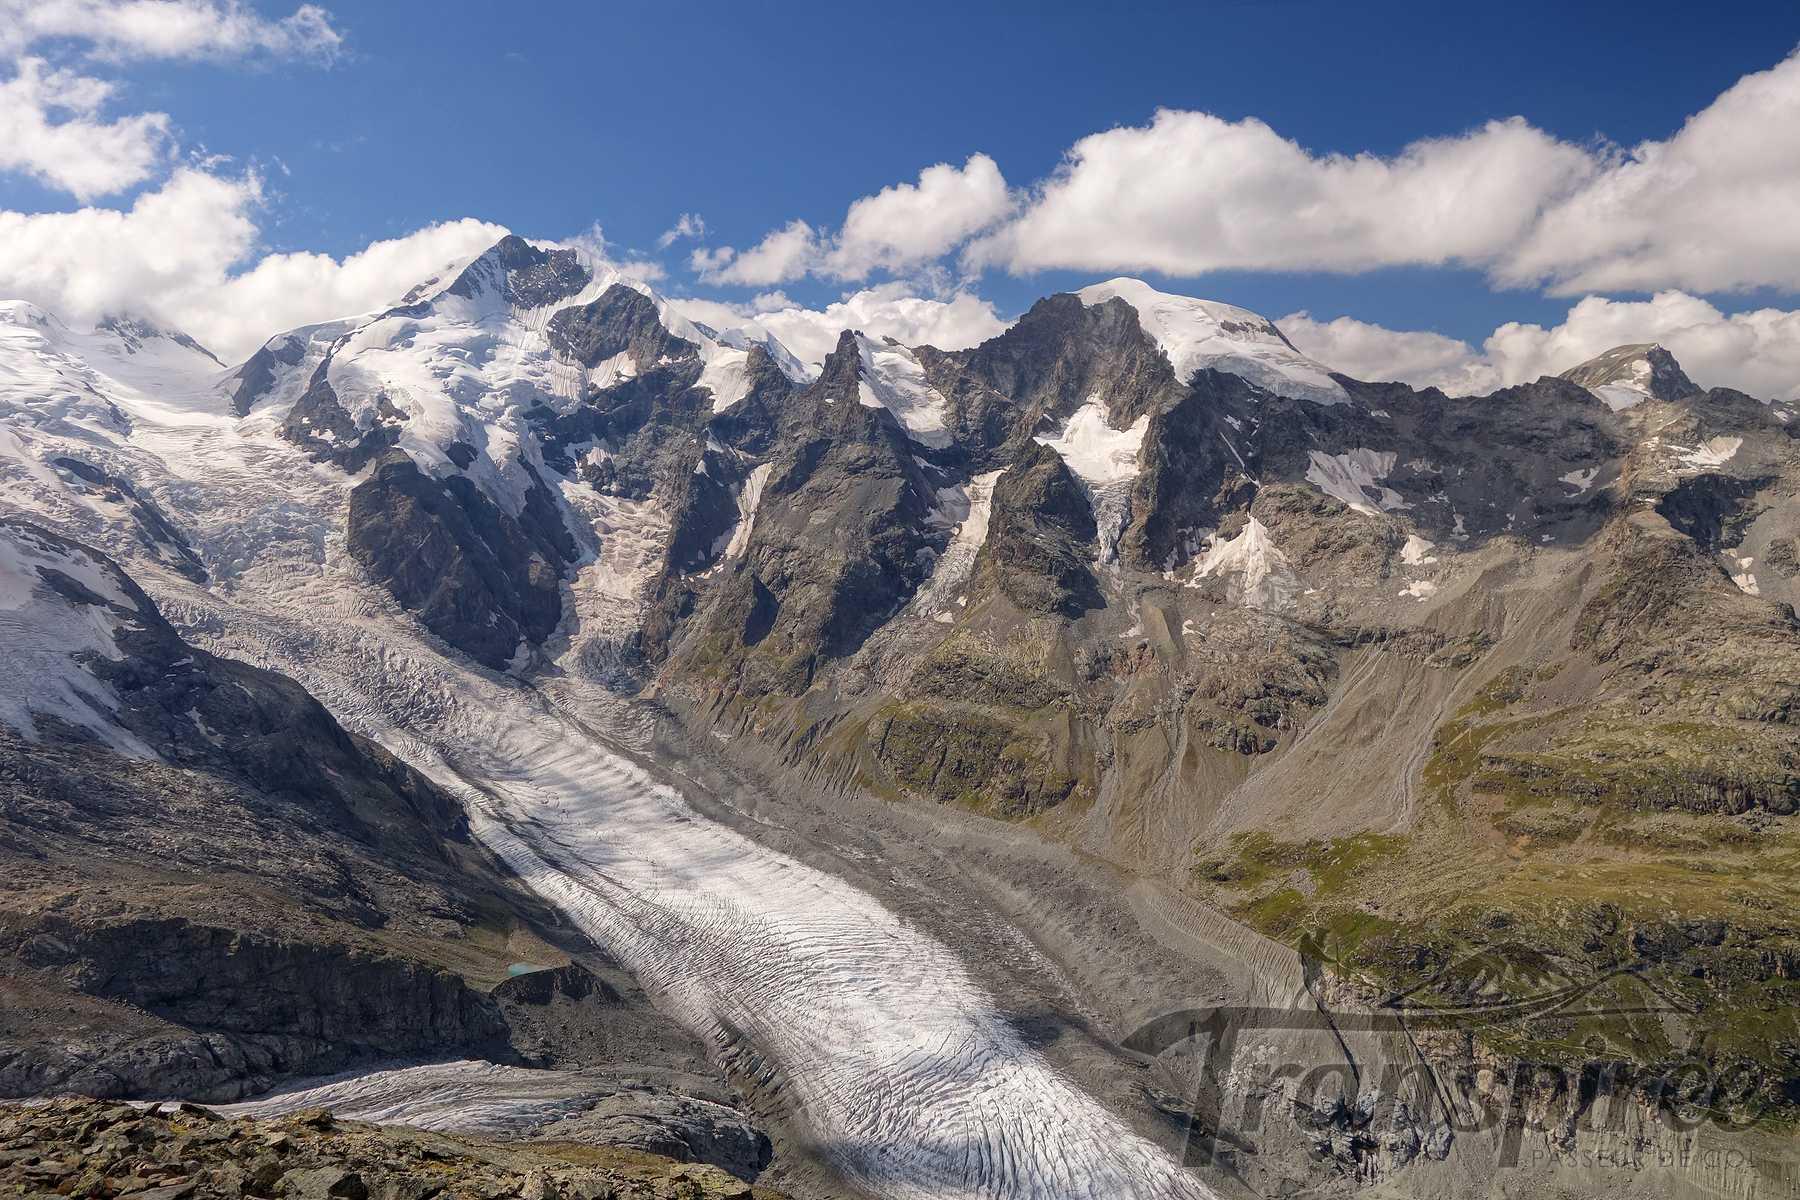 Randonnée au Munt Pers depuis Bernina Diavolezza